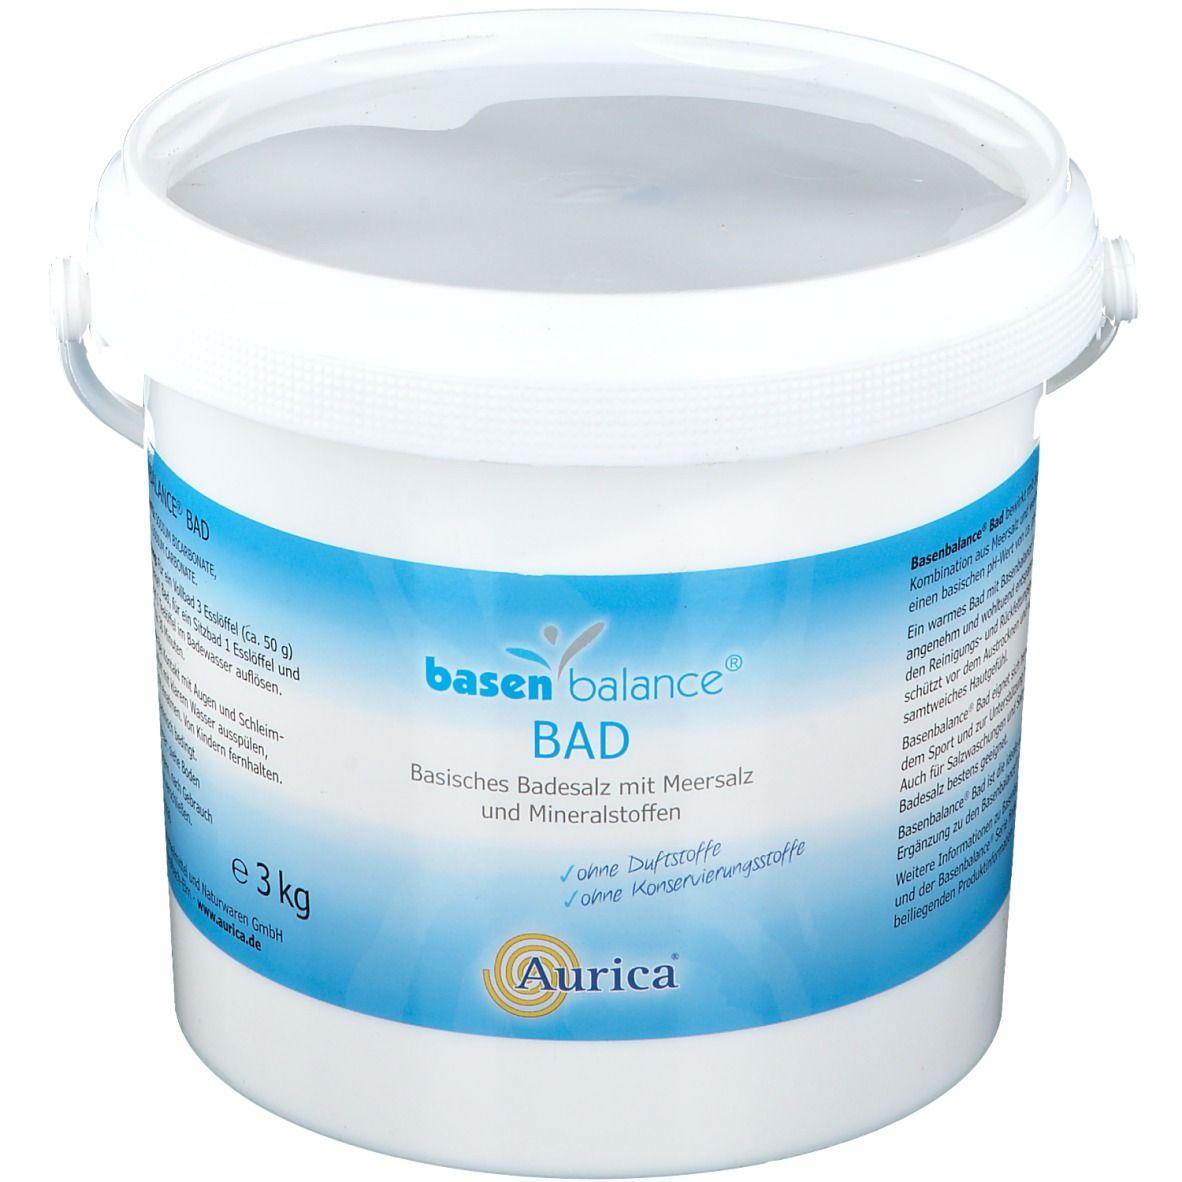 Image of Aurica® Basenbalance® Bad